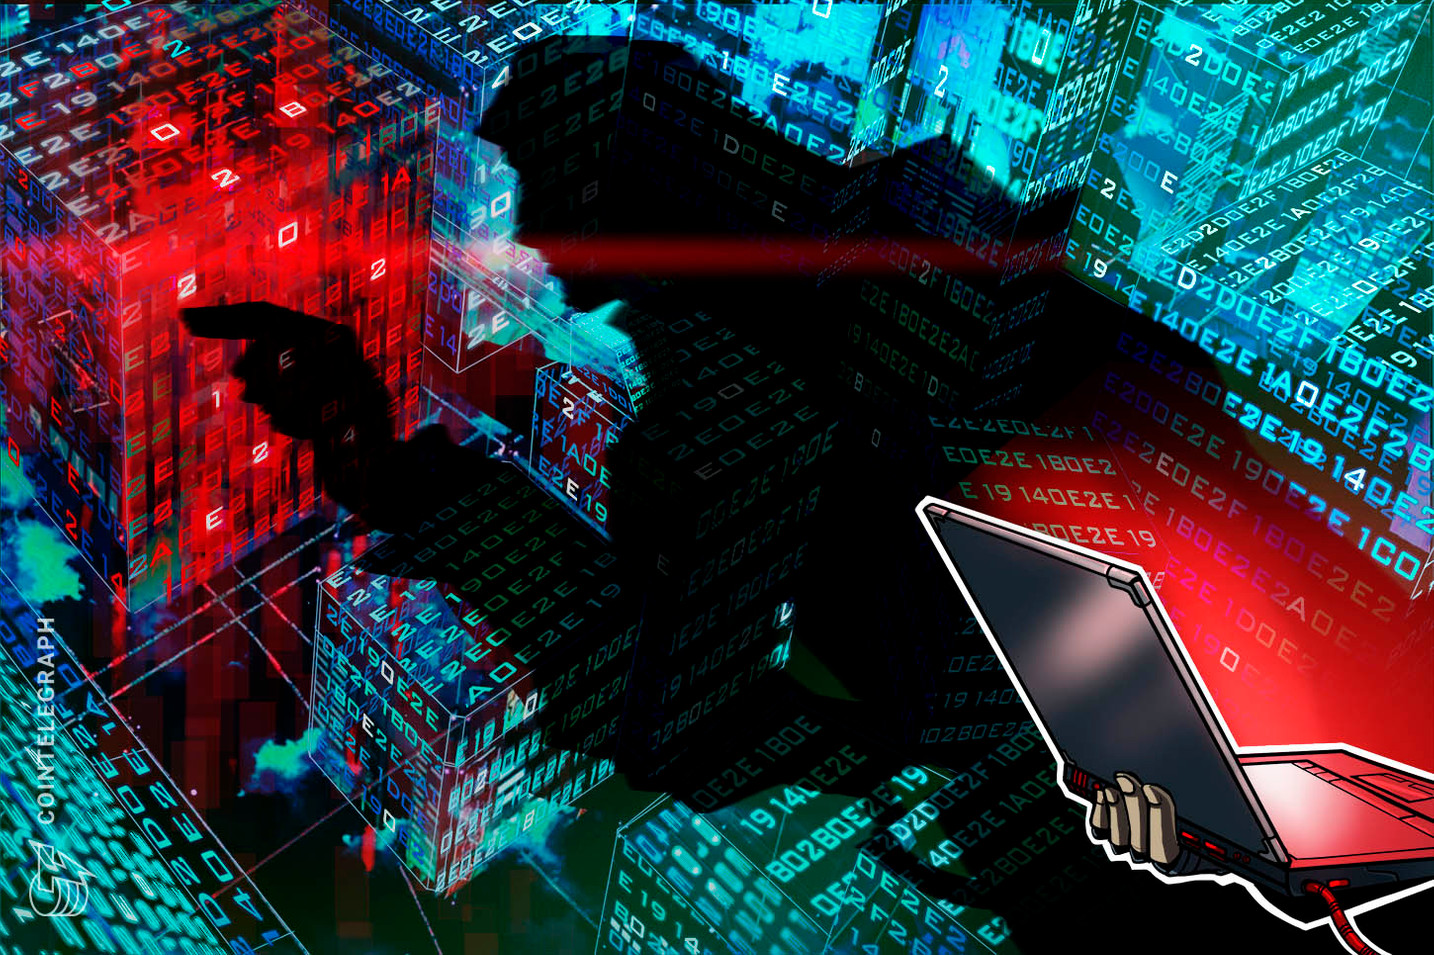 PwC: Bitcoin Ransomware Hackers Laundered Money via WEX Exchange